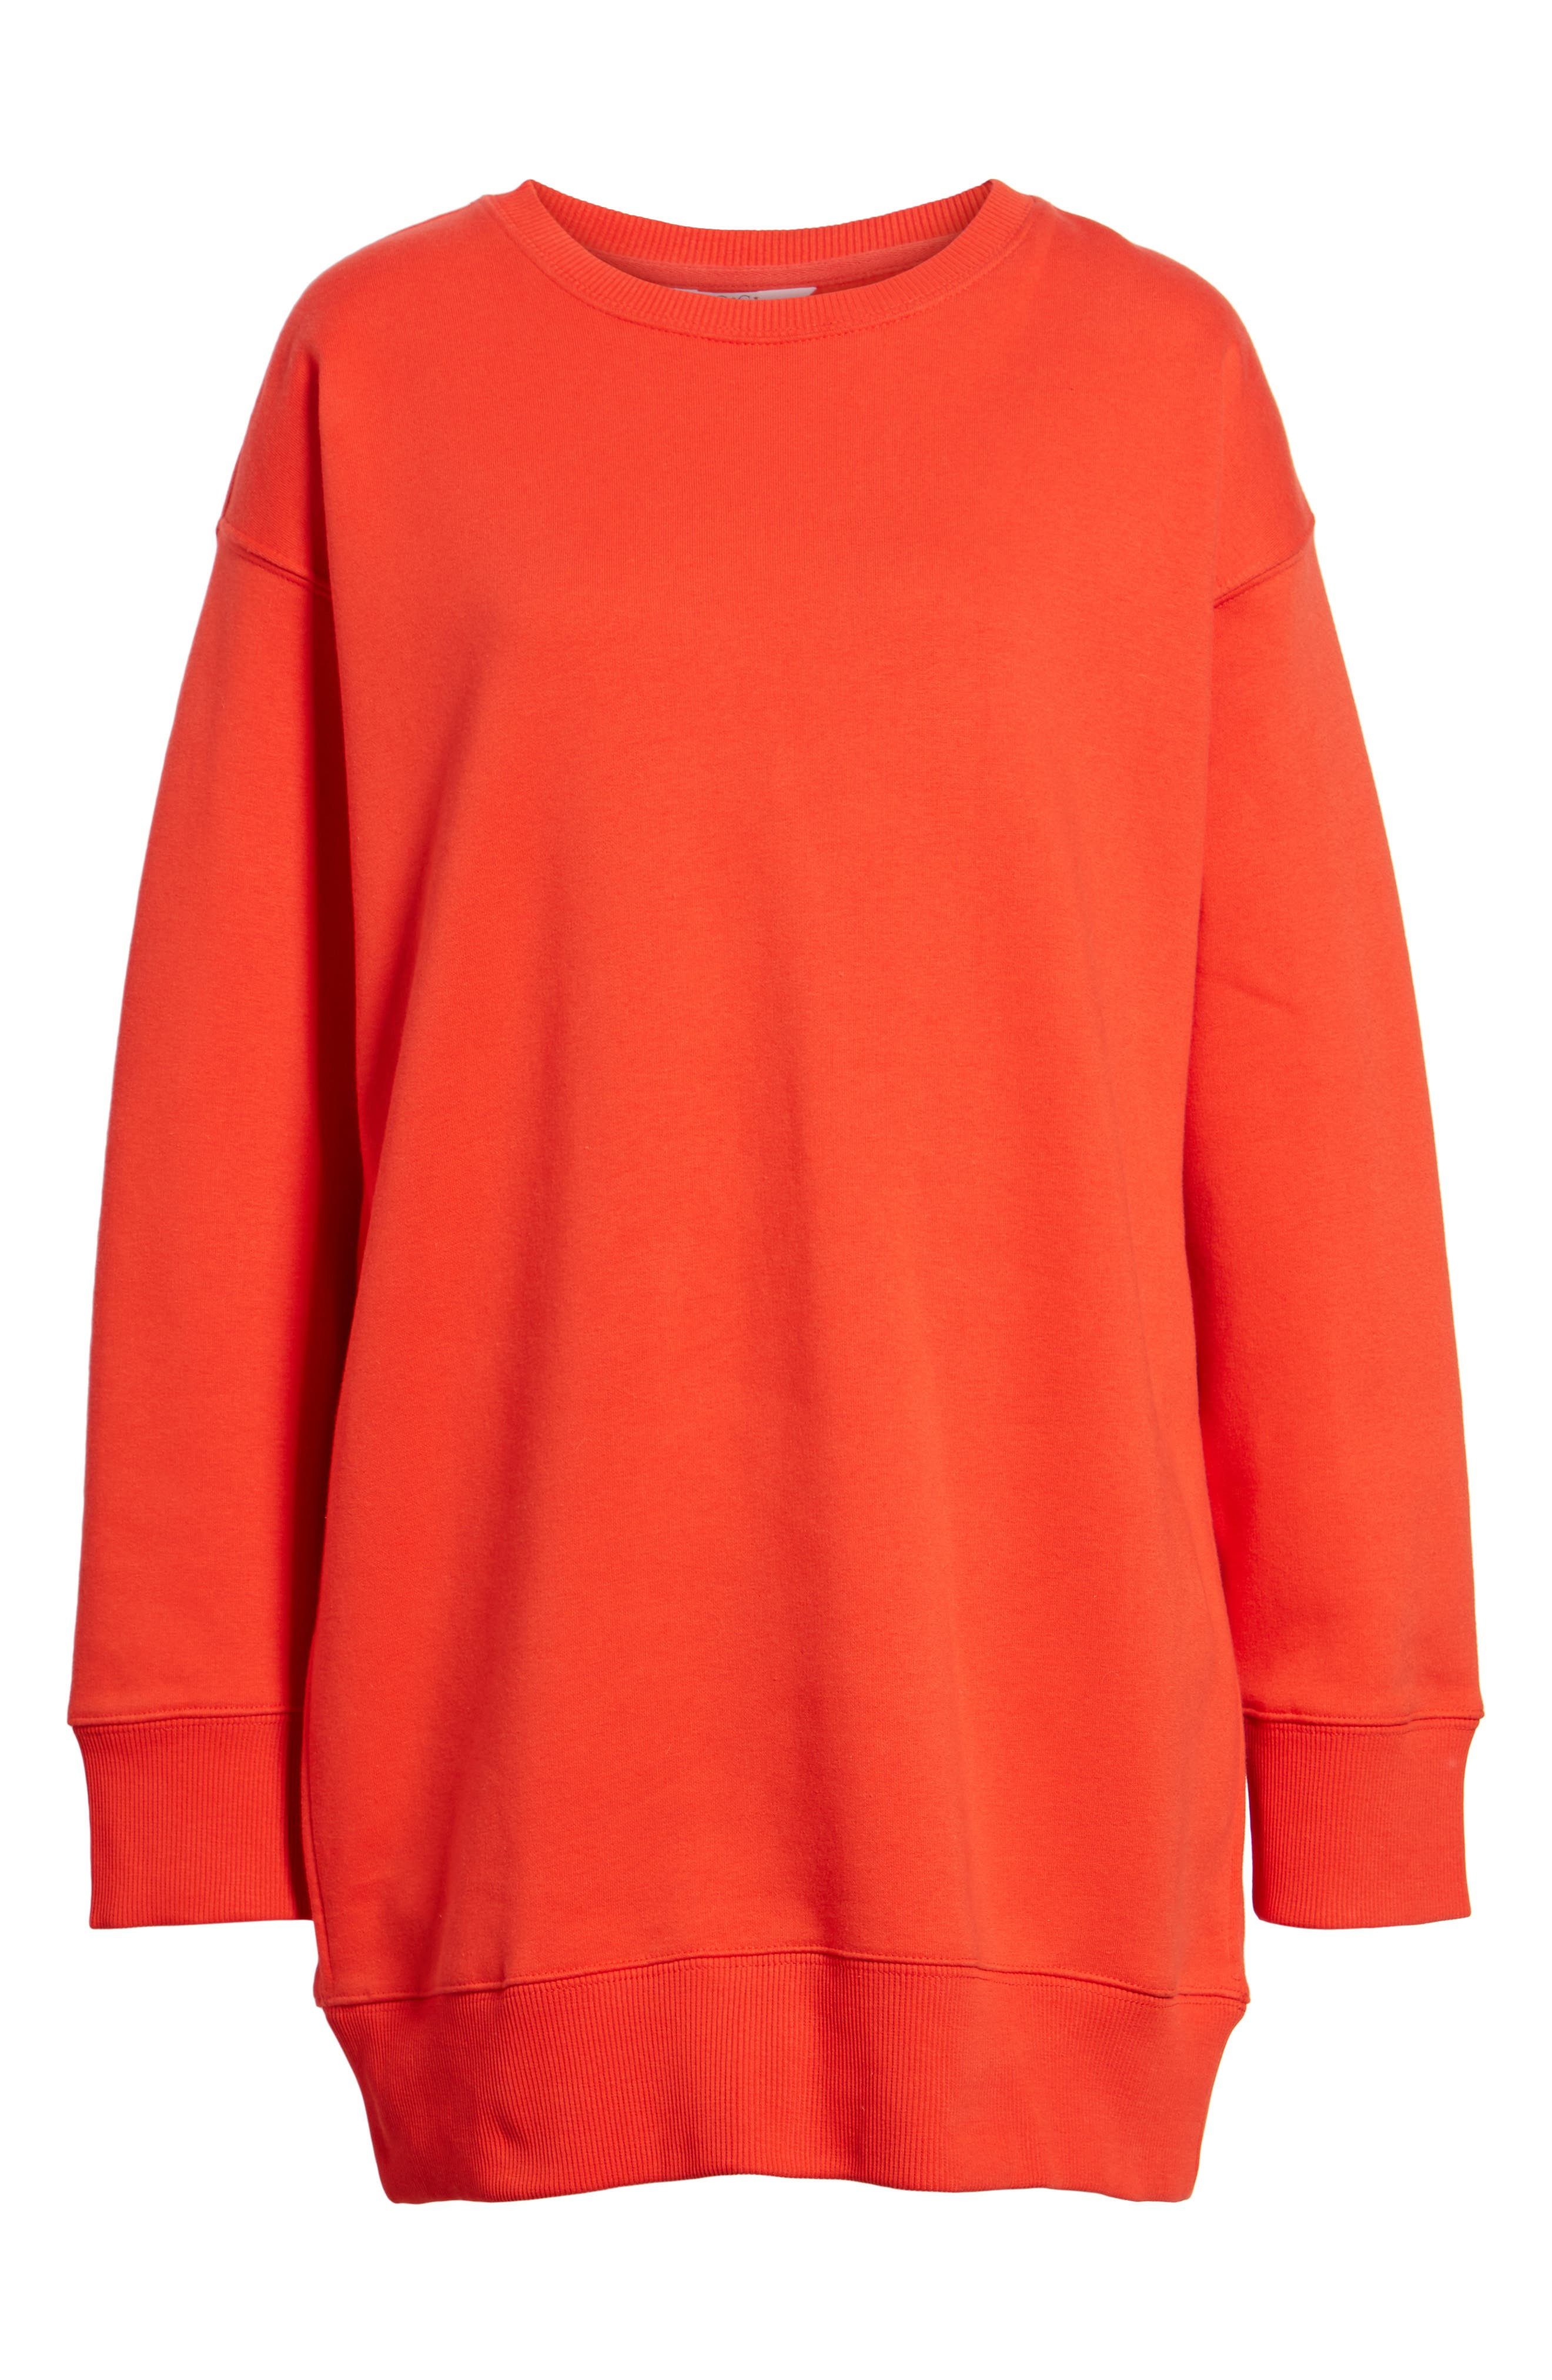 x Gigi Hadid Sweatshirt Dress,                             Alternate thumbnail 6, color,                             Flame Scarlet